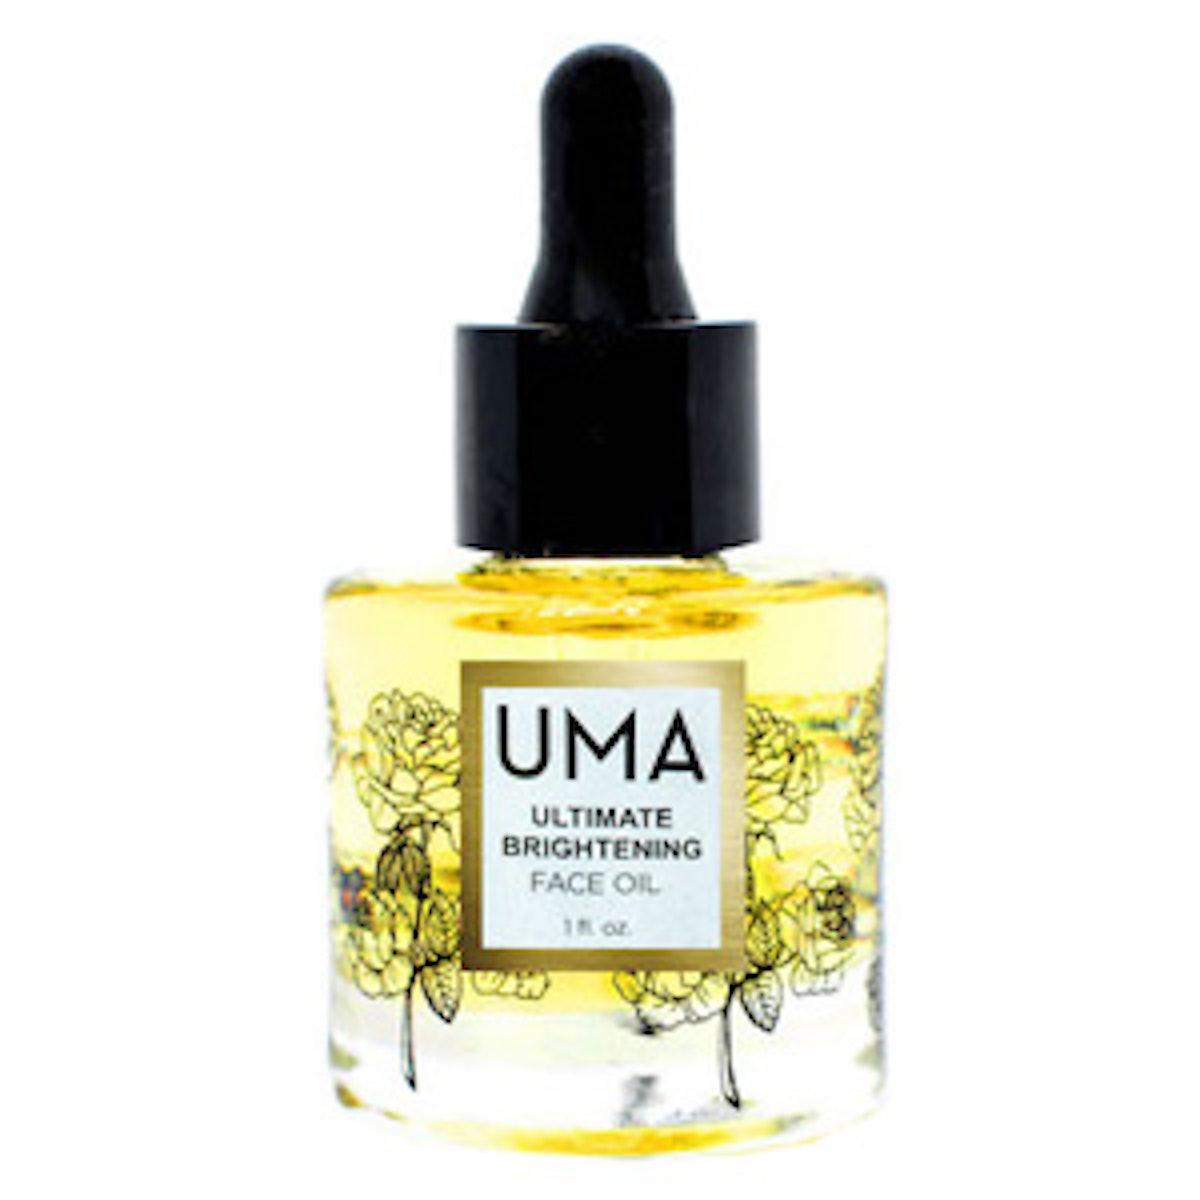 Ultimate Brightening Face Oil